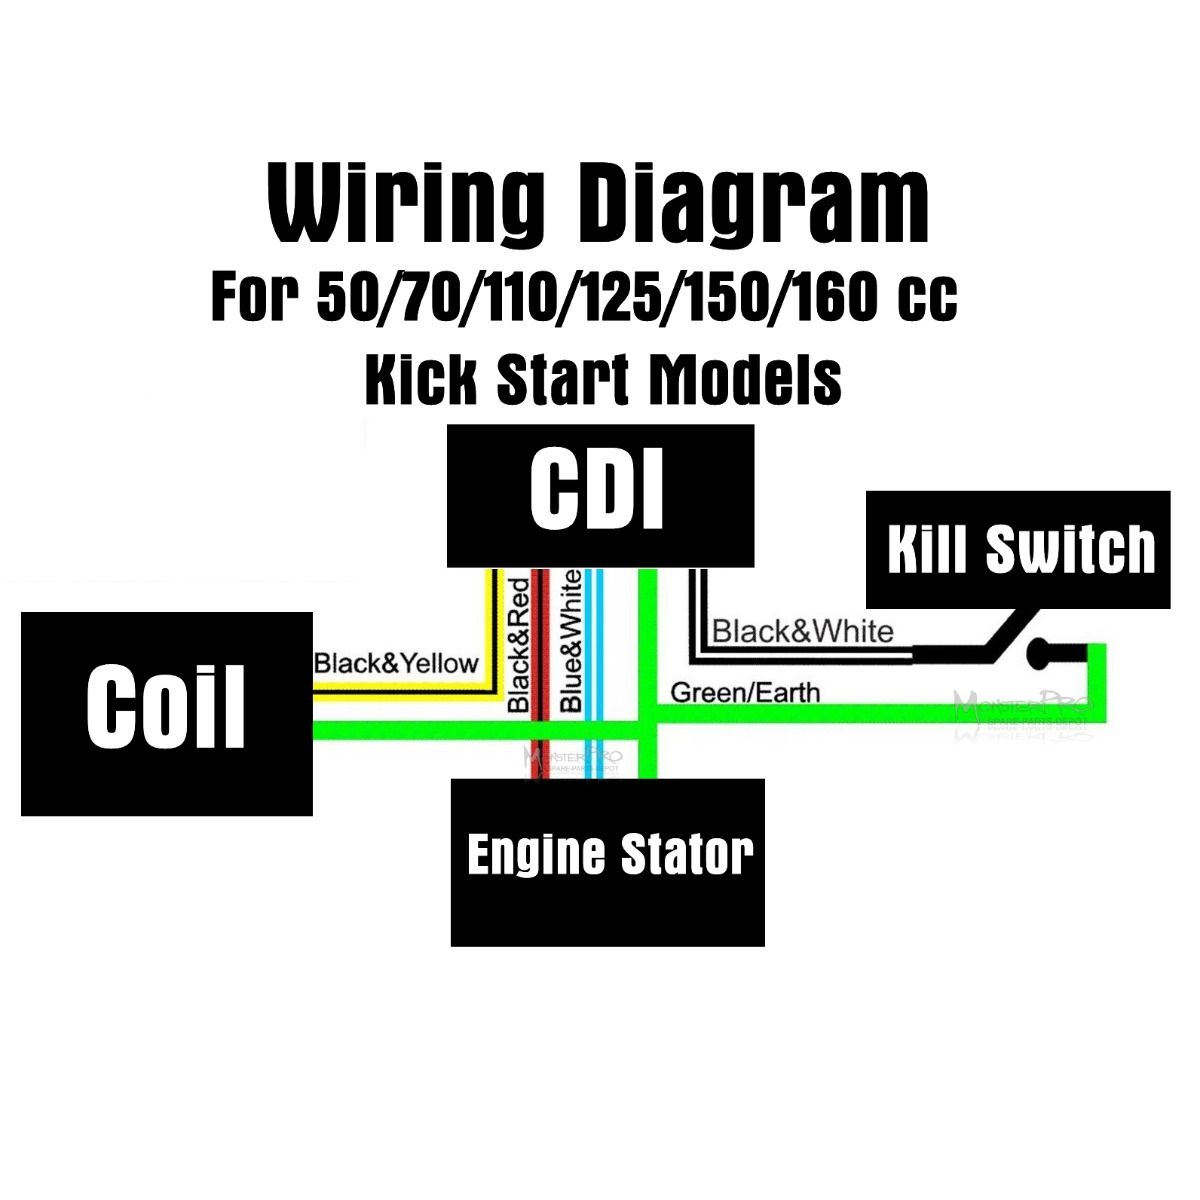 Wiring Diagram Furthermore Lifan 125 Wiring Diagram Further Wiring